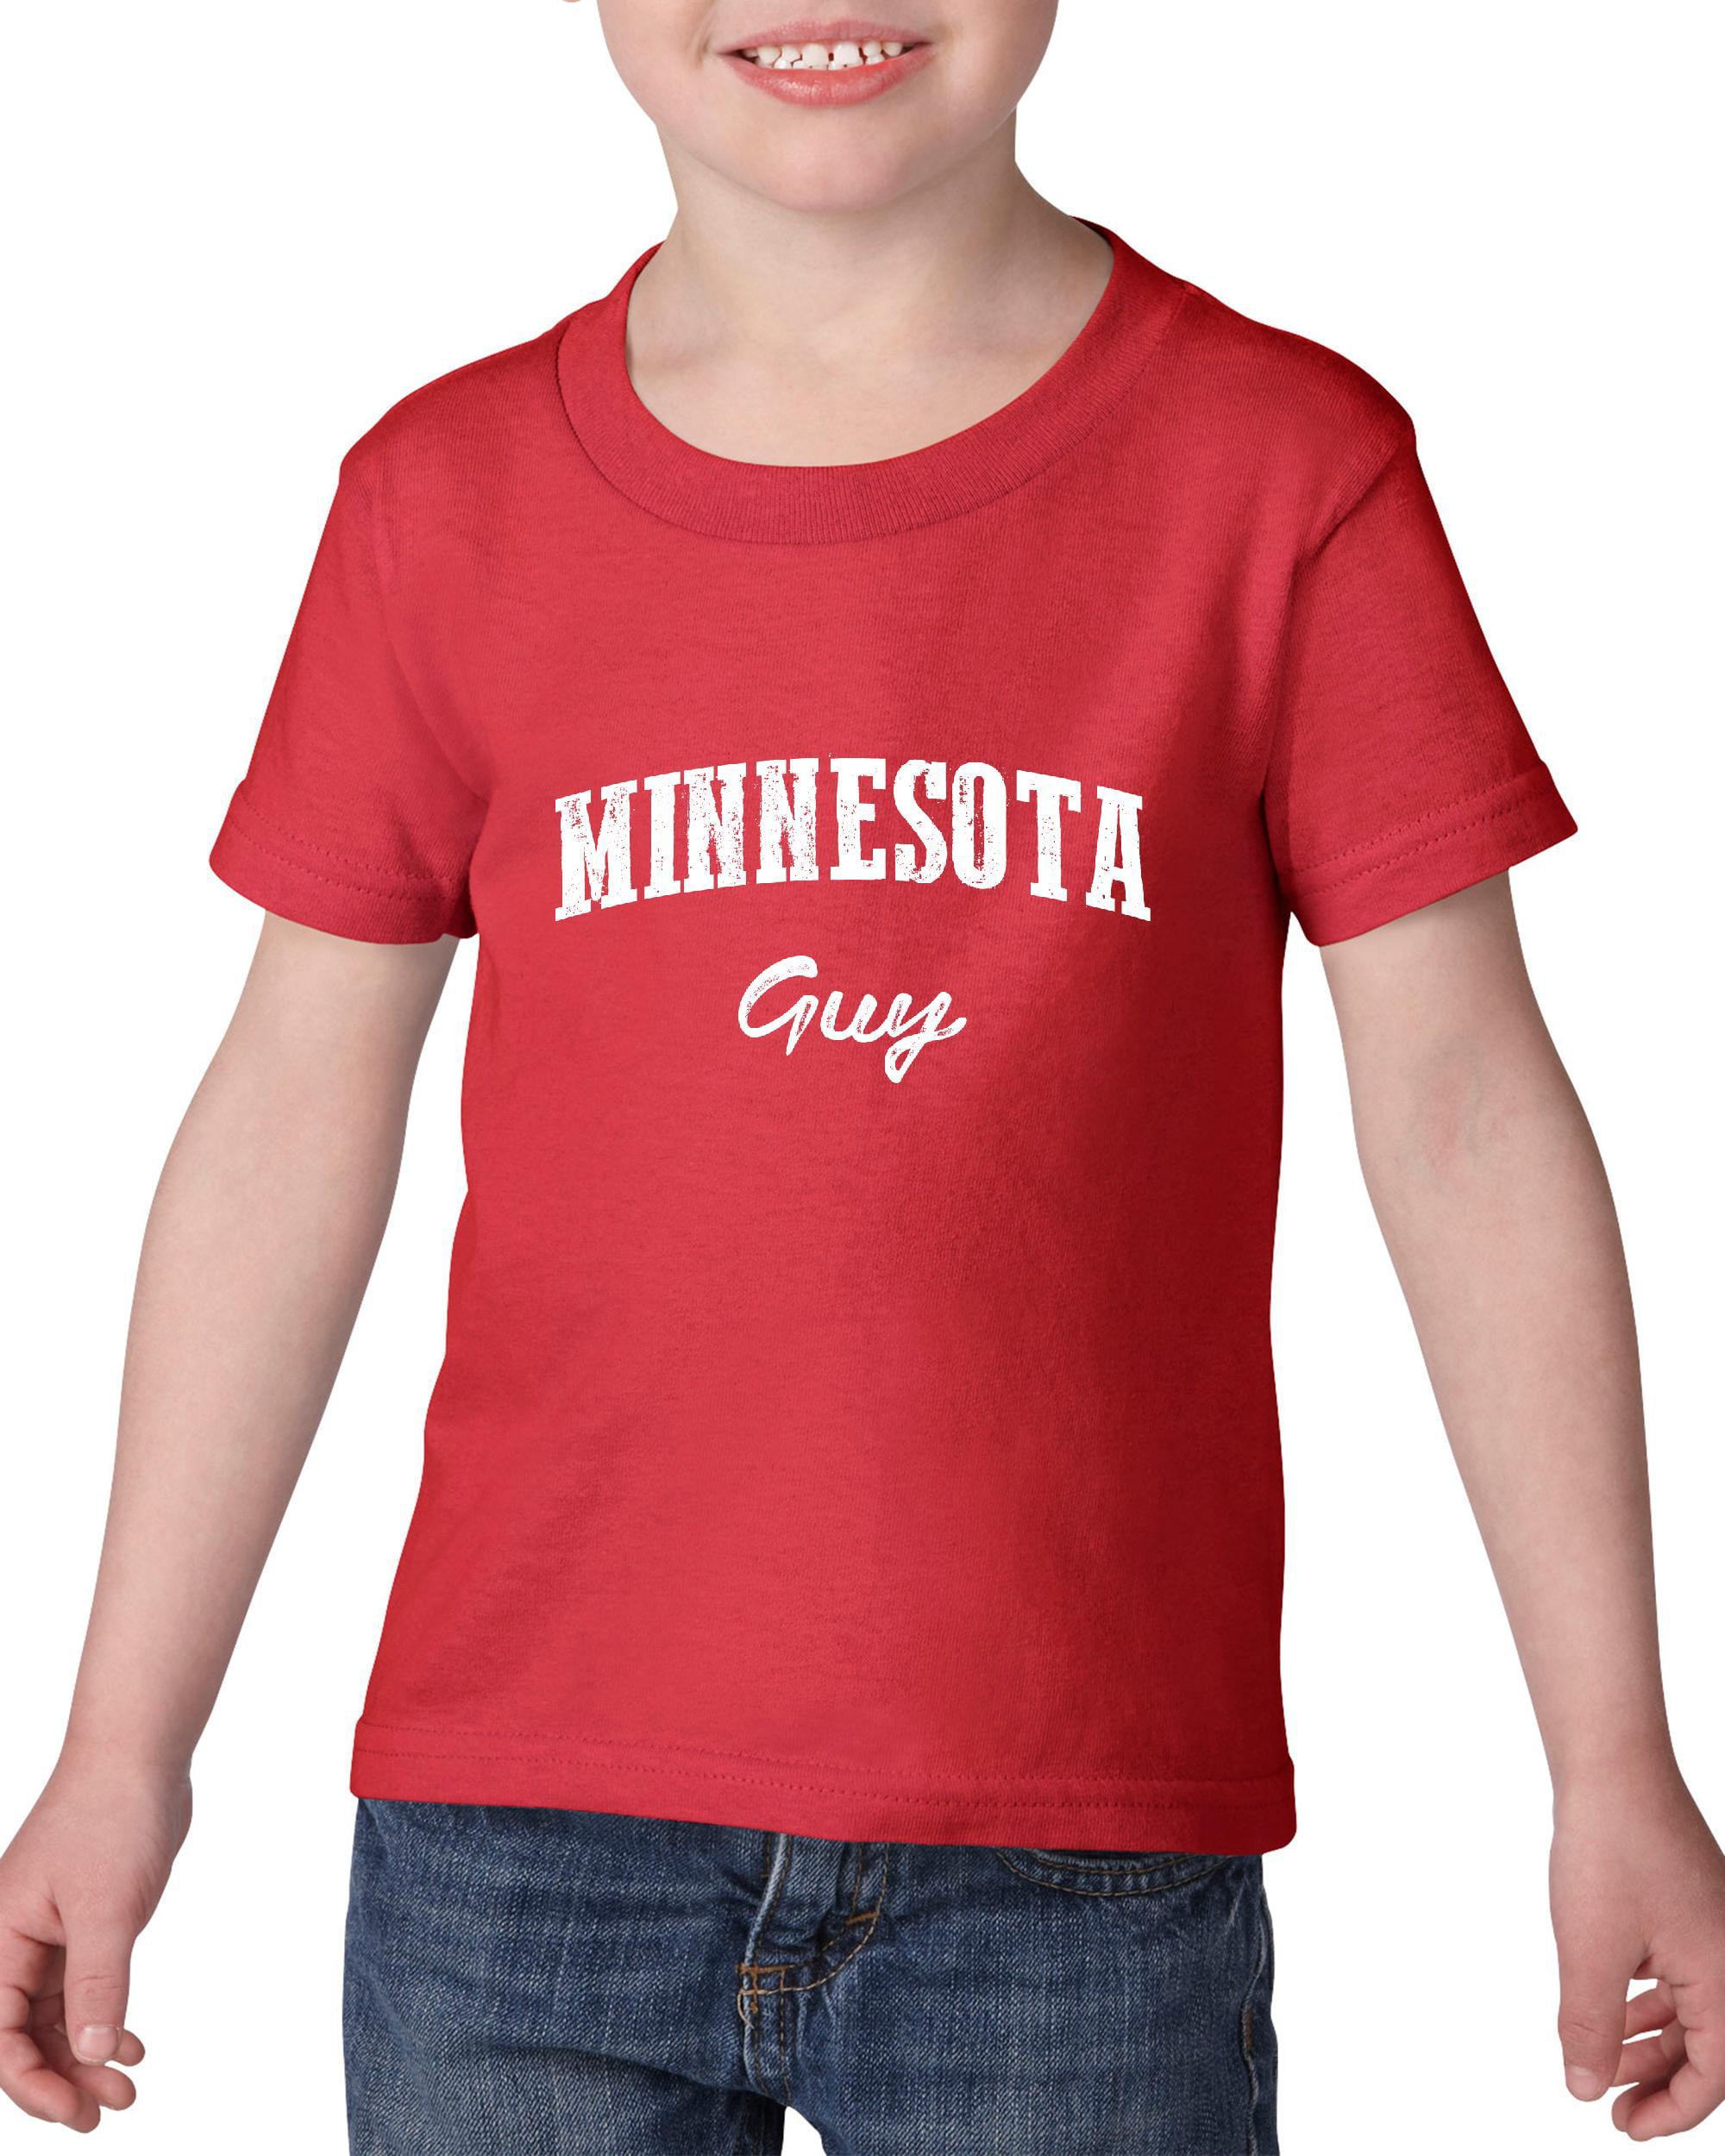 Artix MN Guy Map Minneapolis Flag Golden Gophers Home University of Minnesota Heavy Cotton Toddler Kids T-Shirt Tee Clothing